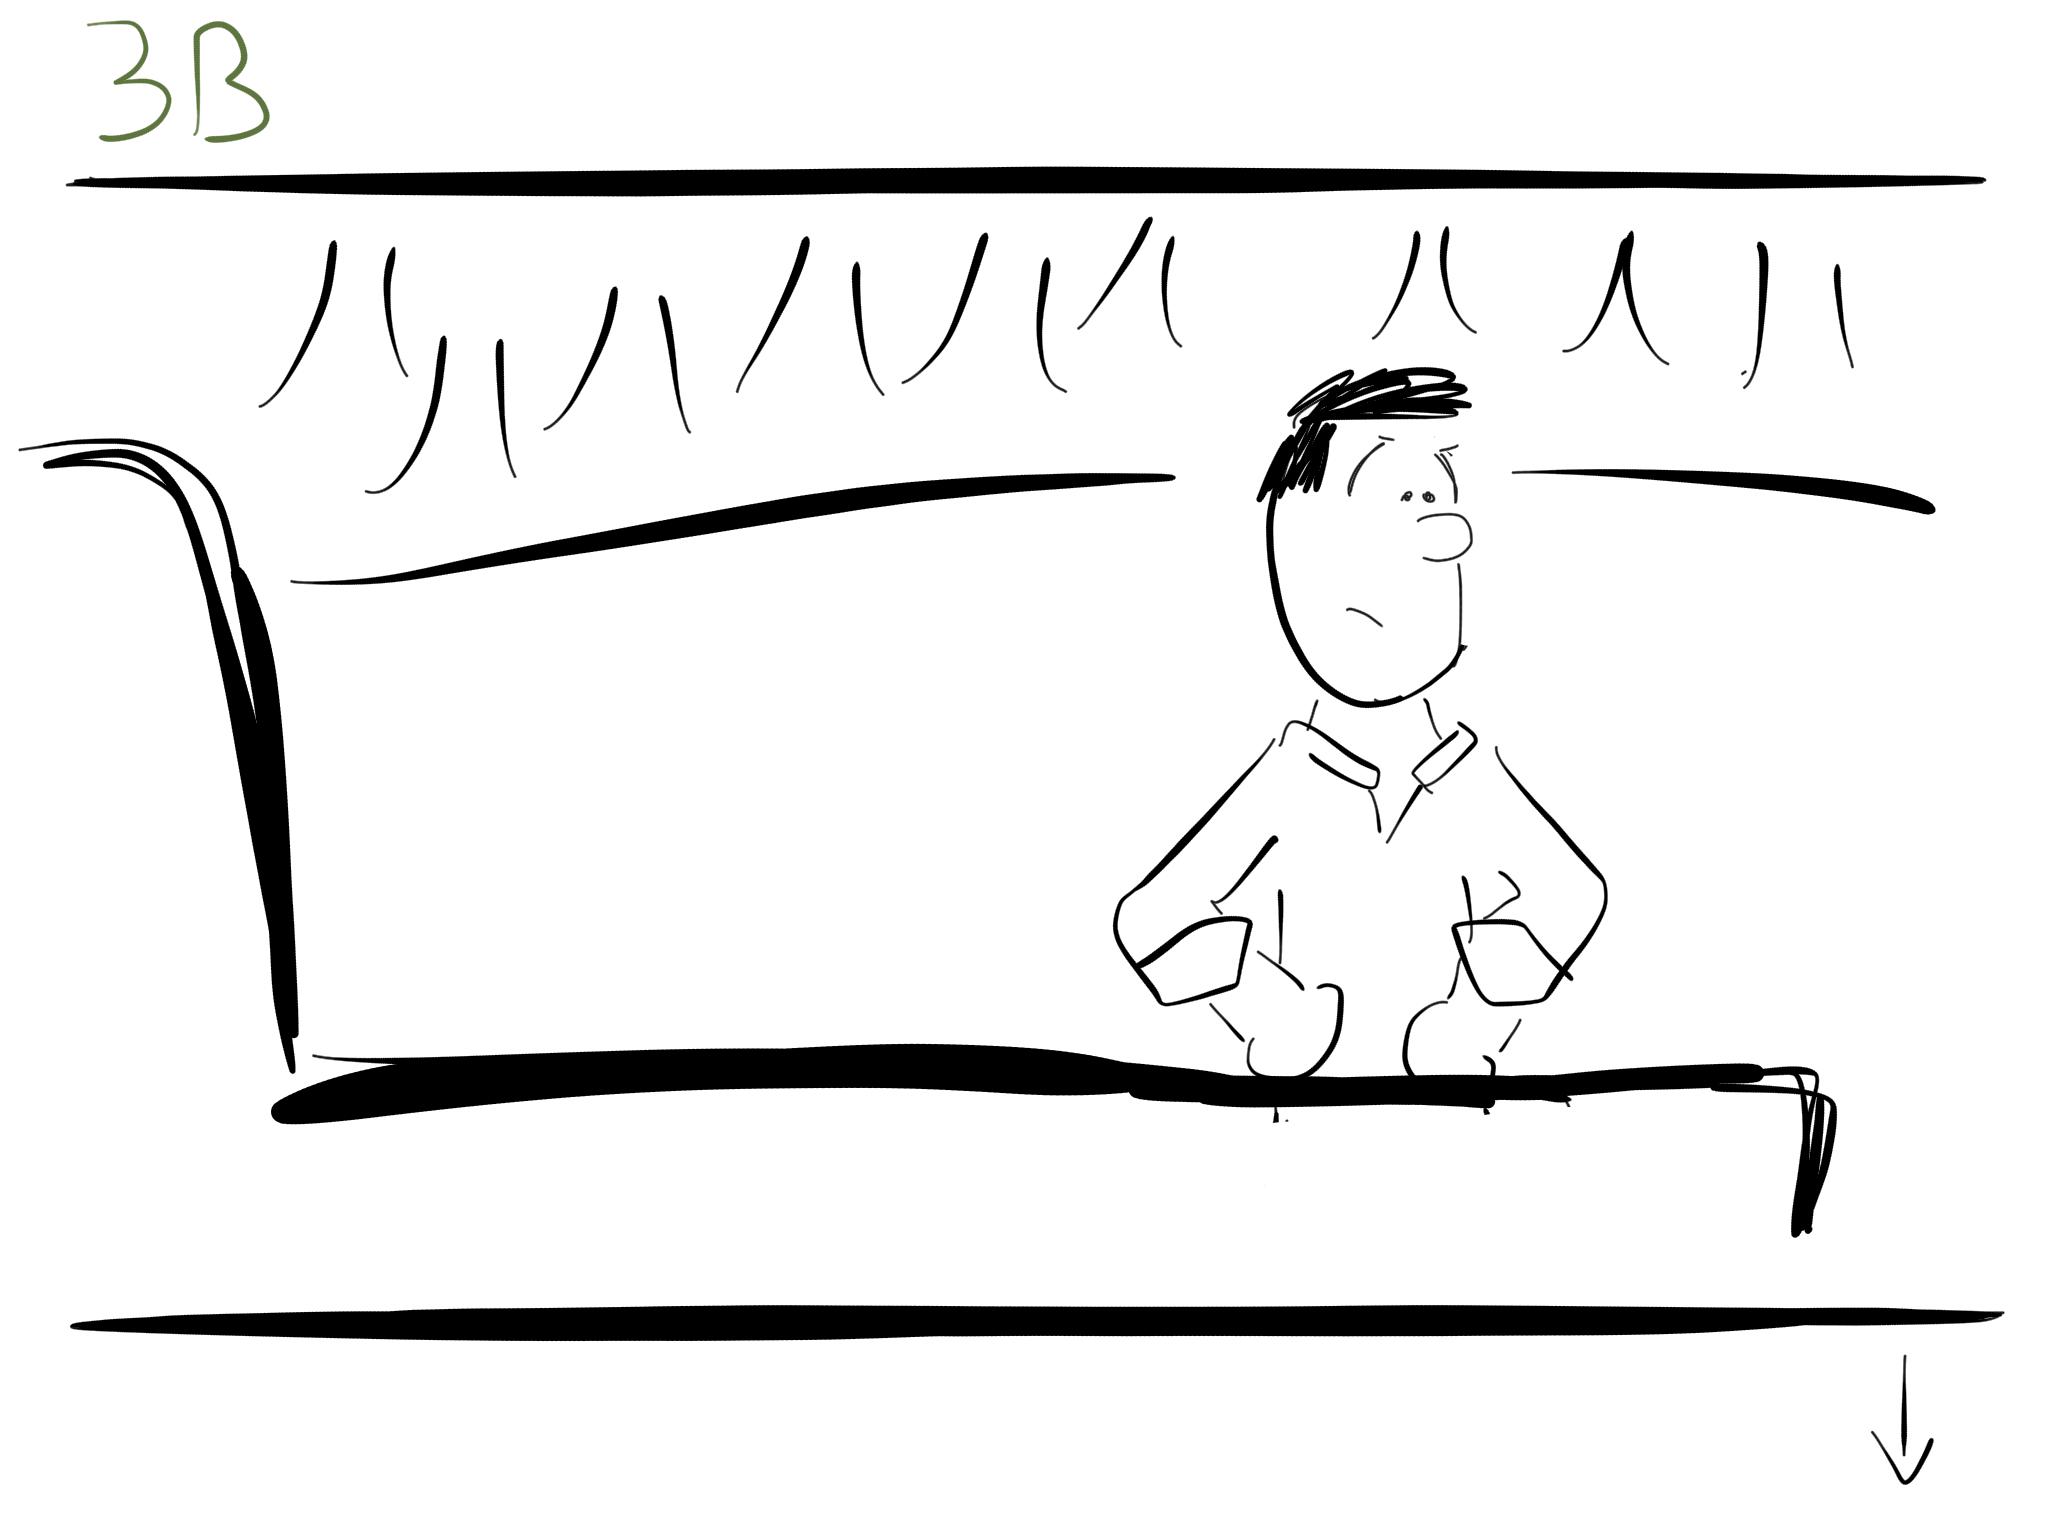 BDF_Storyboards_07.jpg